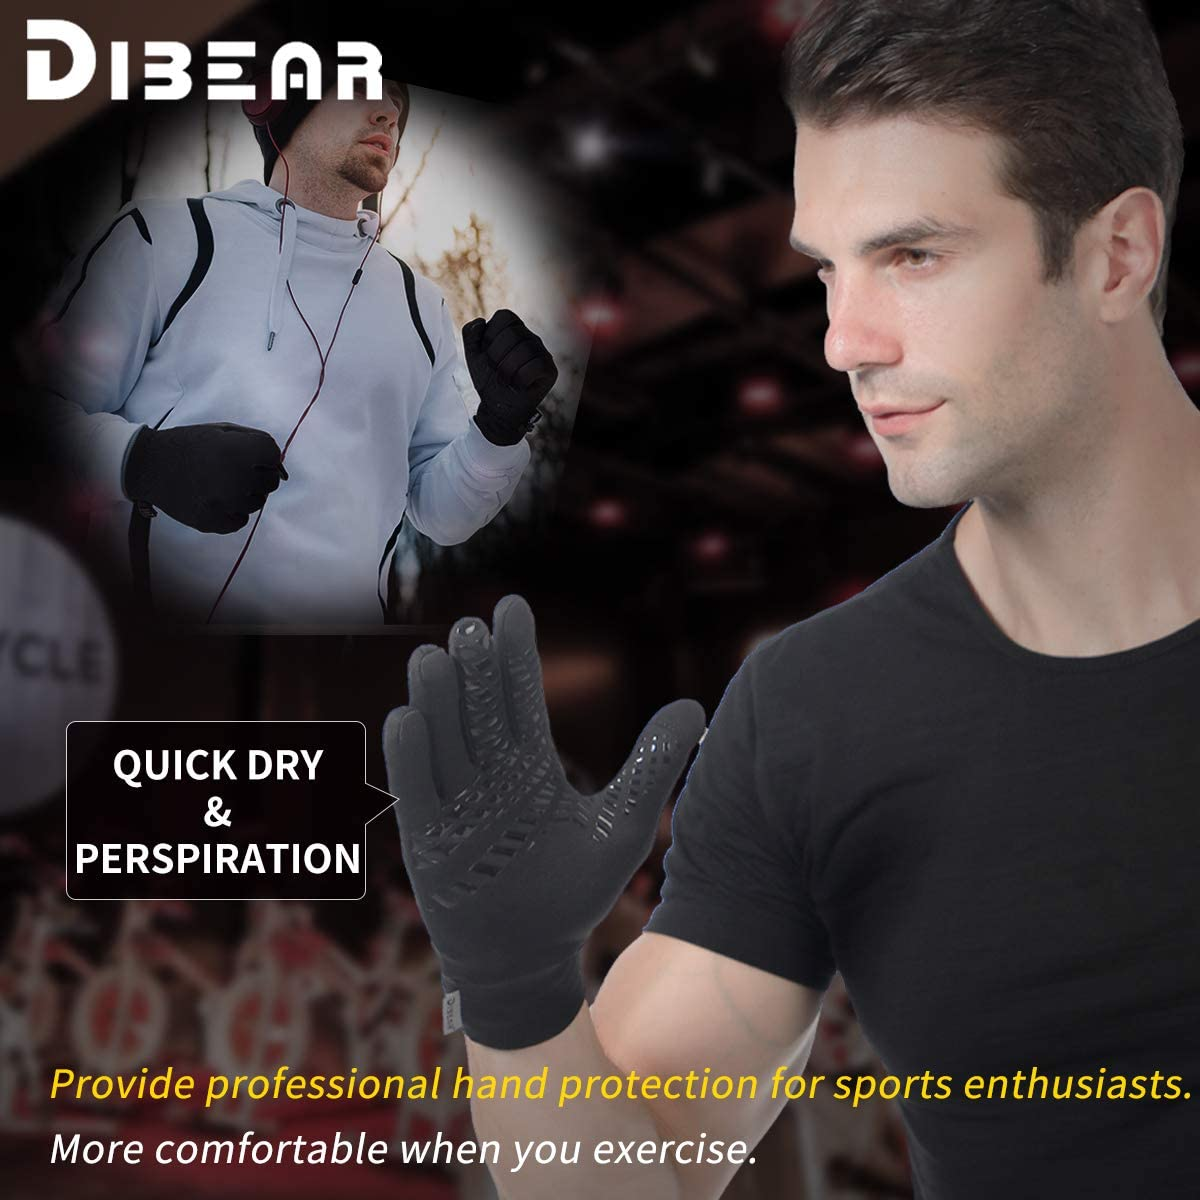 DIBEAR Winter Gloves of Men Women Anti-Slip Warm Touchscreen Gloves For Cycling Running Outdoor Training Activities